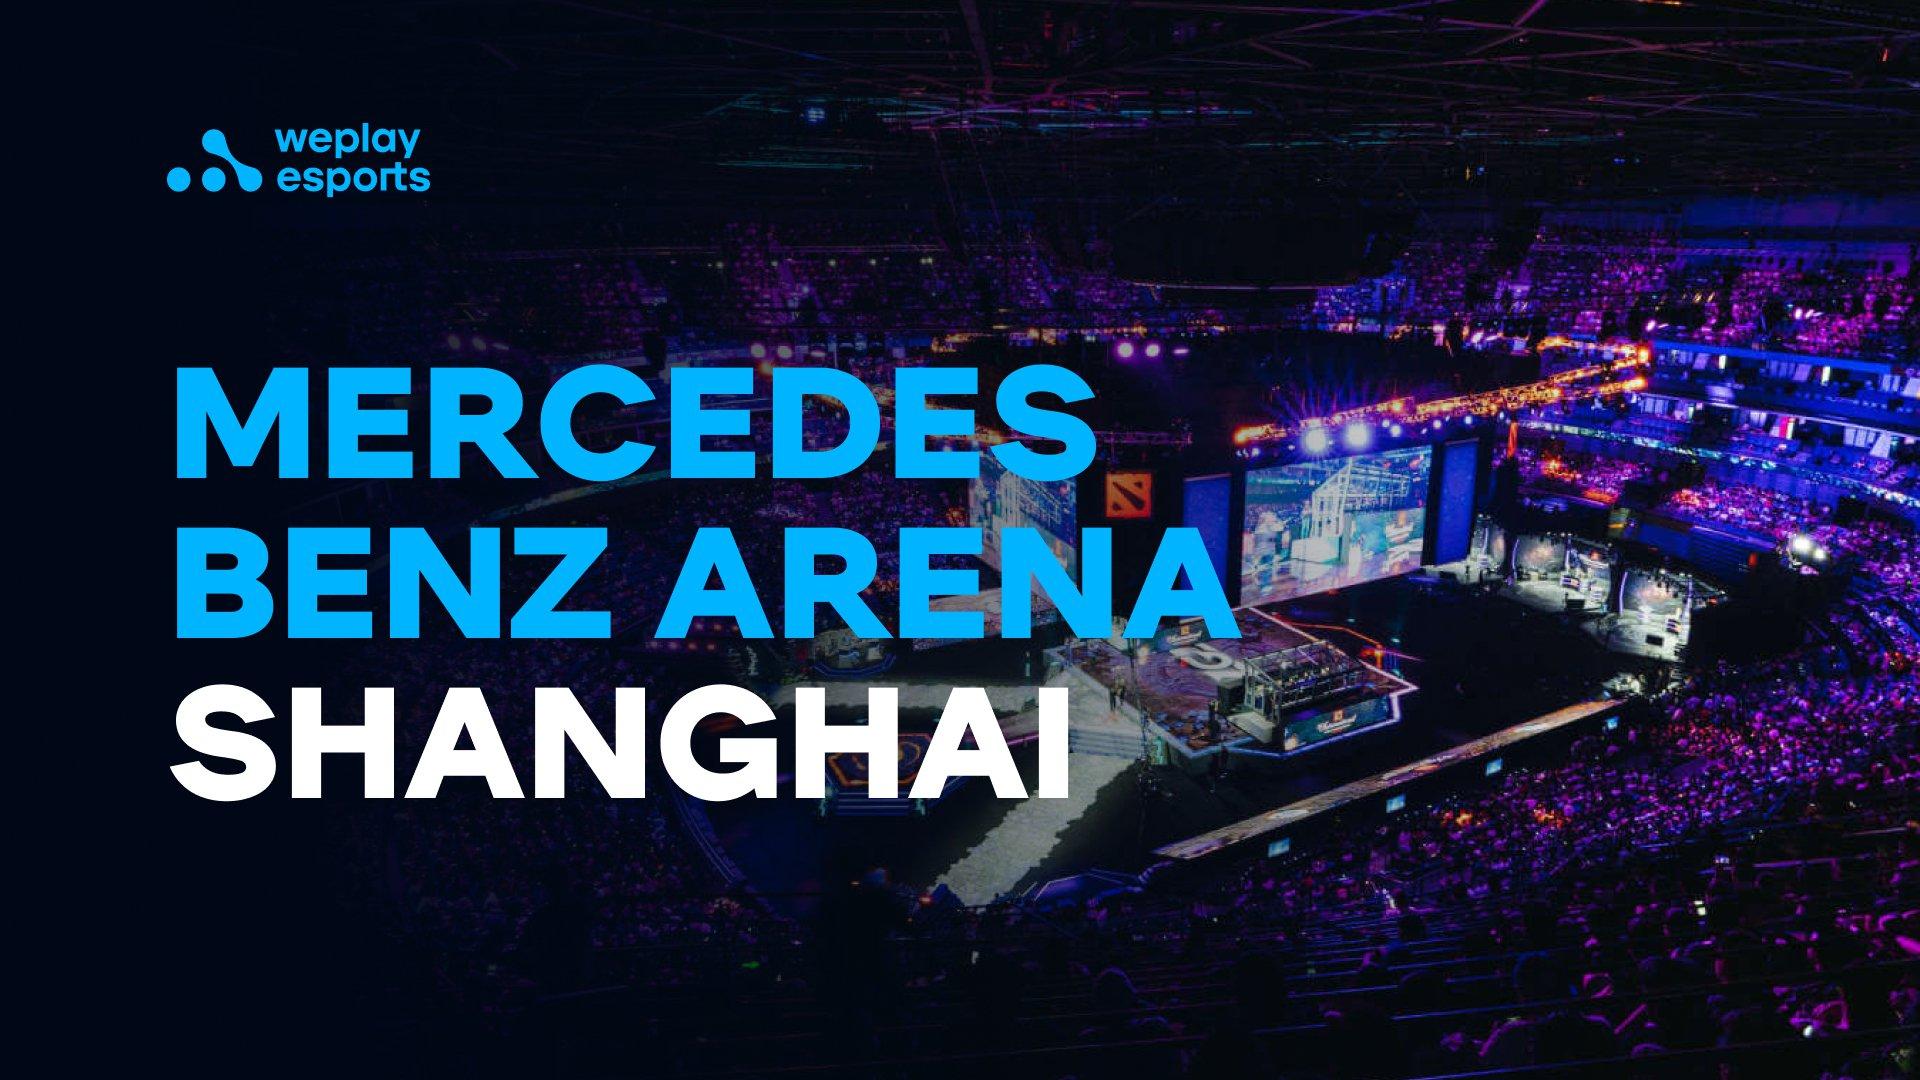 Mercedes Benz Arena Shanghai